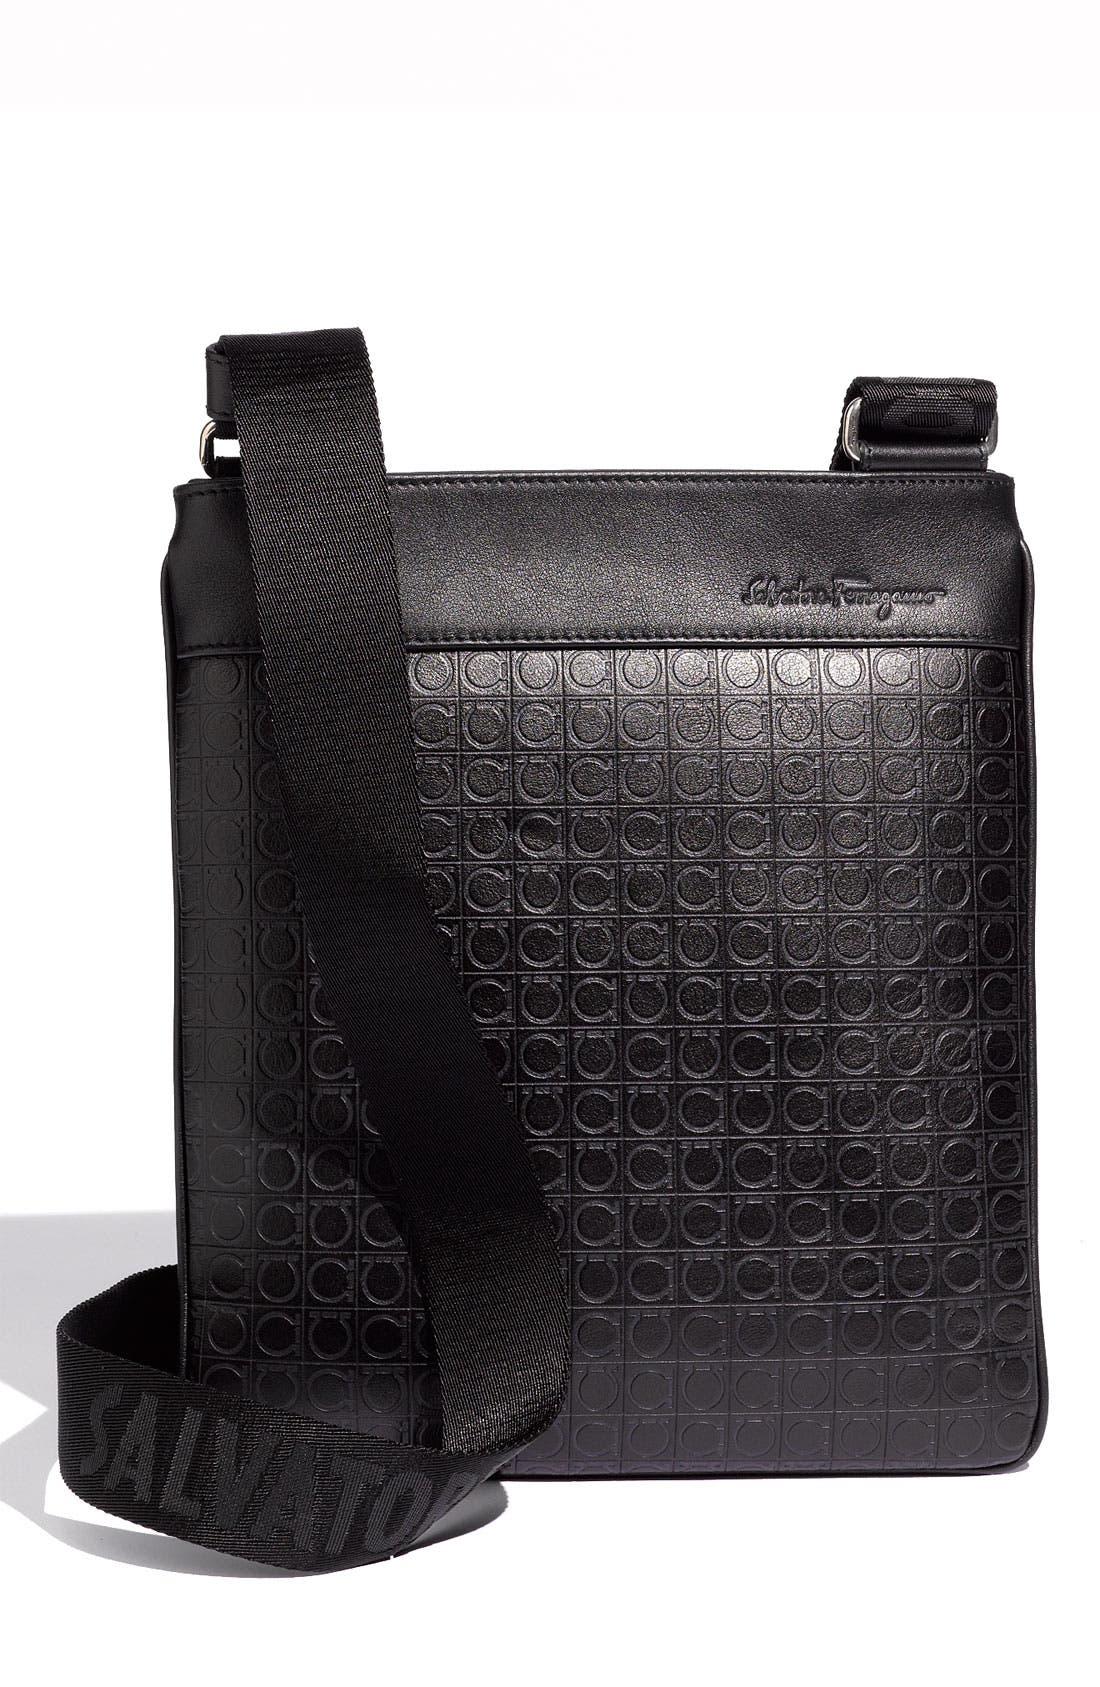 Main Image - Salvatore Ferragamo 'Gamma' Messenger Bag